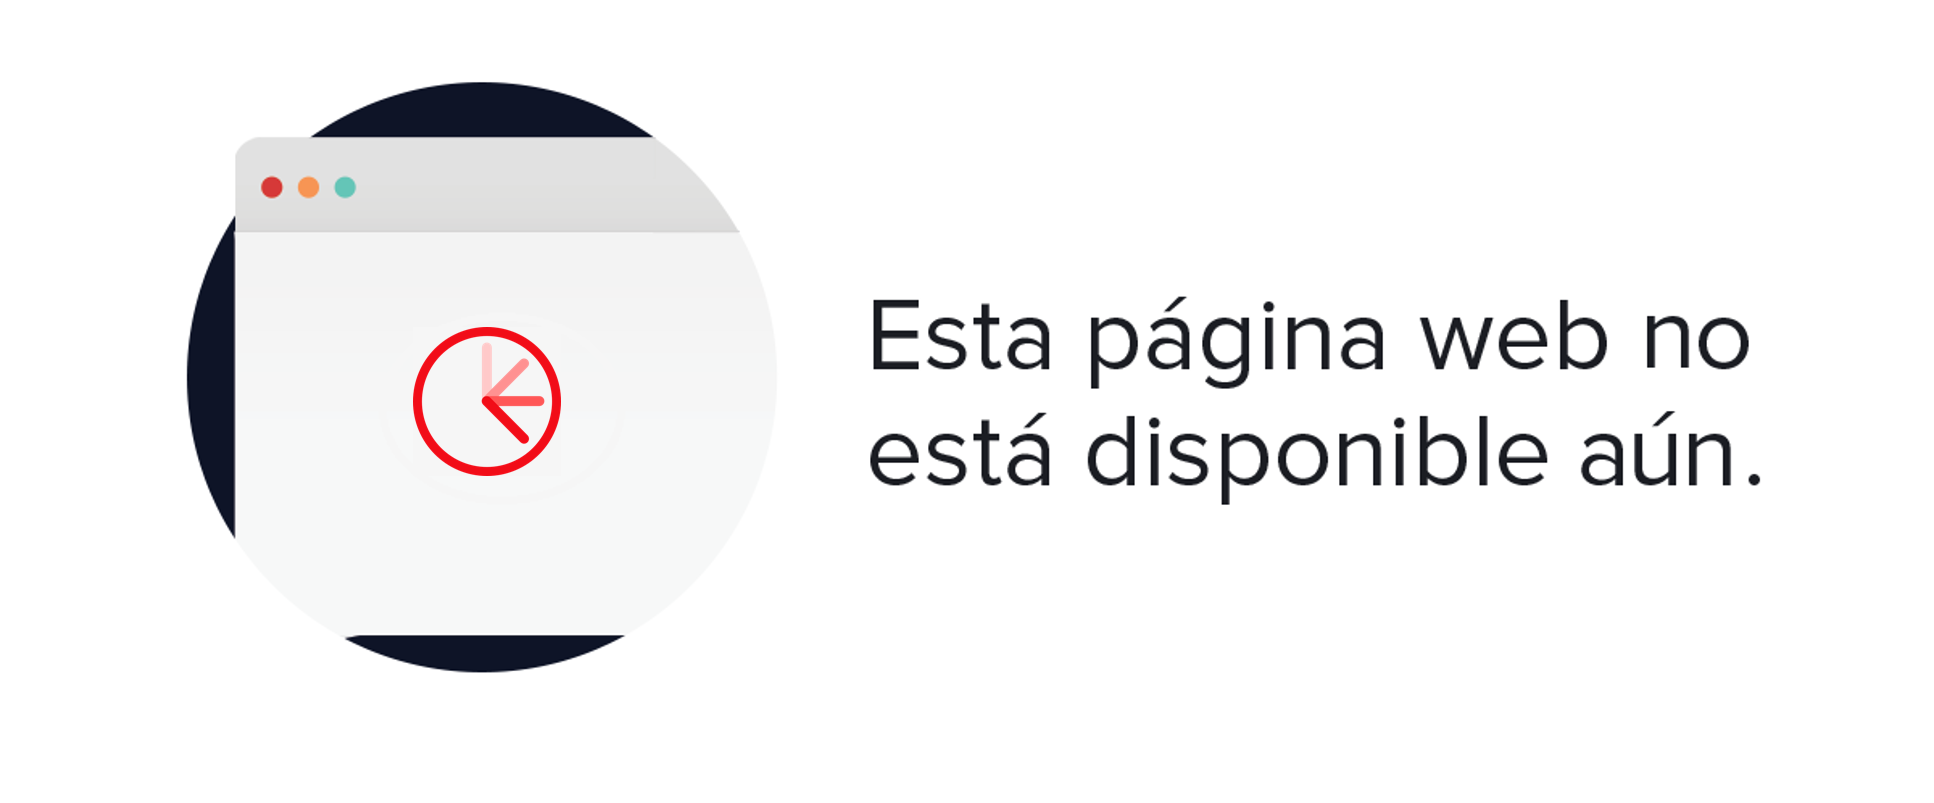 http://www.motorpower.es/attachments/offtopic/687d1326109414-proceder-persona-te-dana-coche-62858_tema_pedobear_0.png